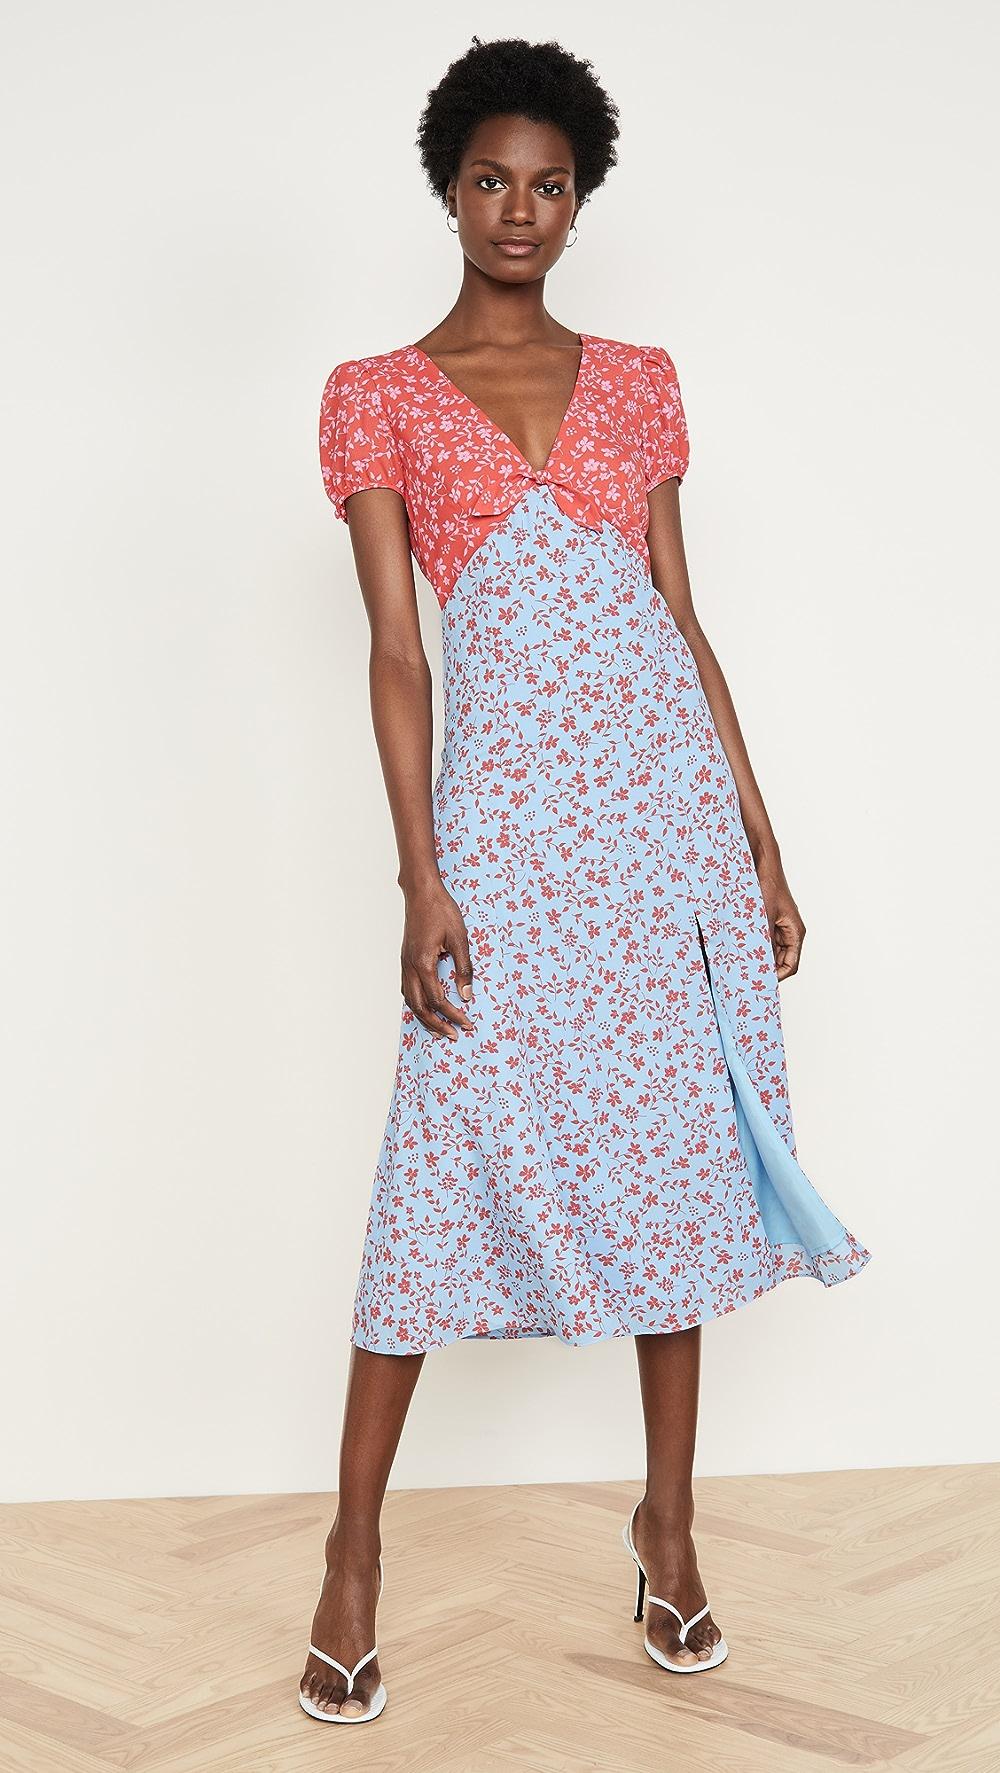 Original Likely - Raffa Dress Moderate Cost